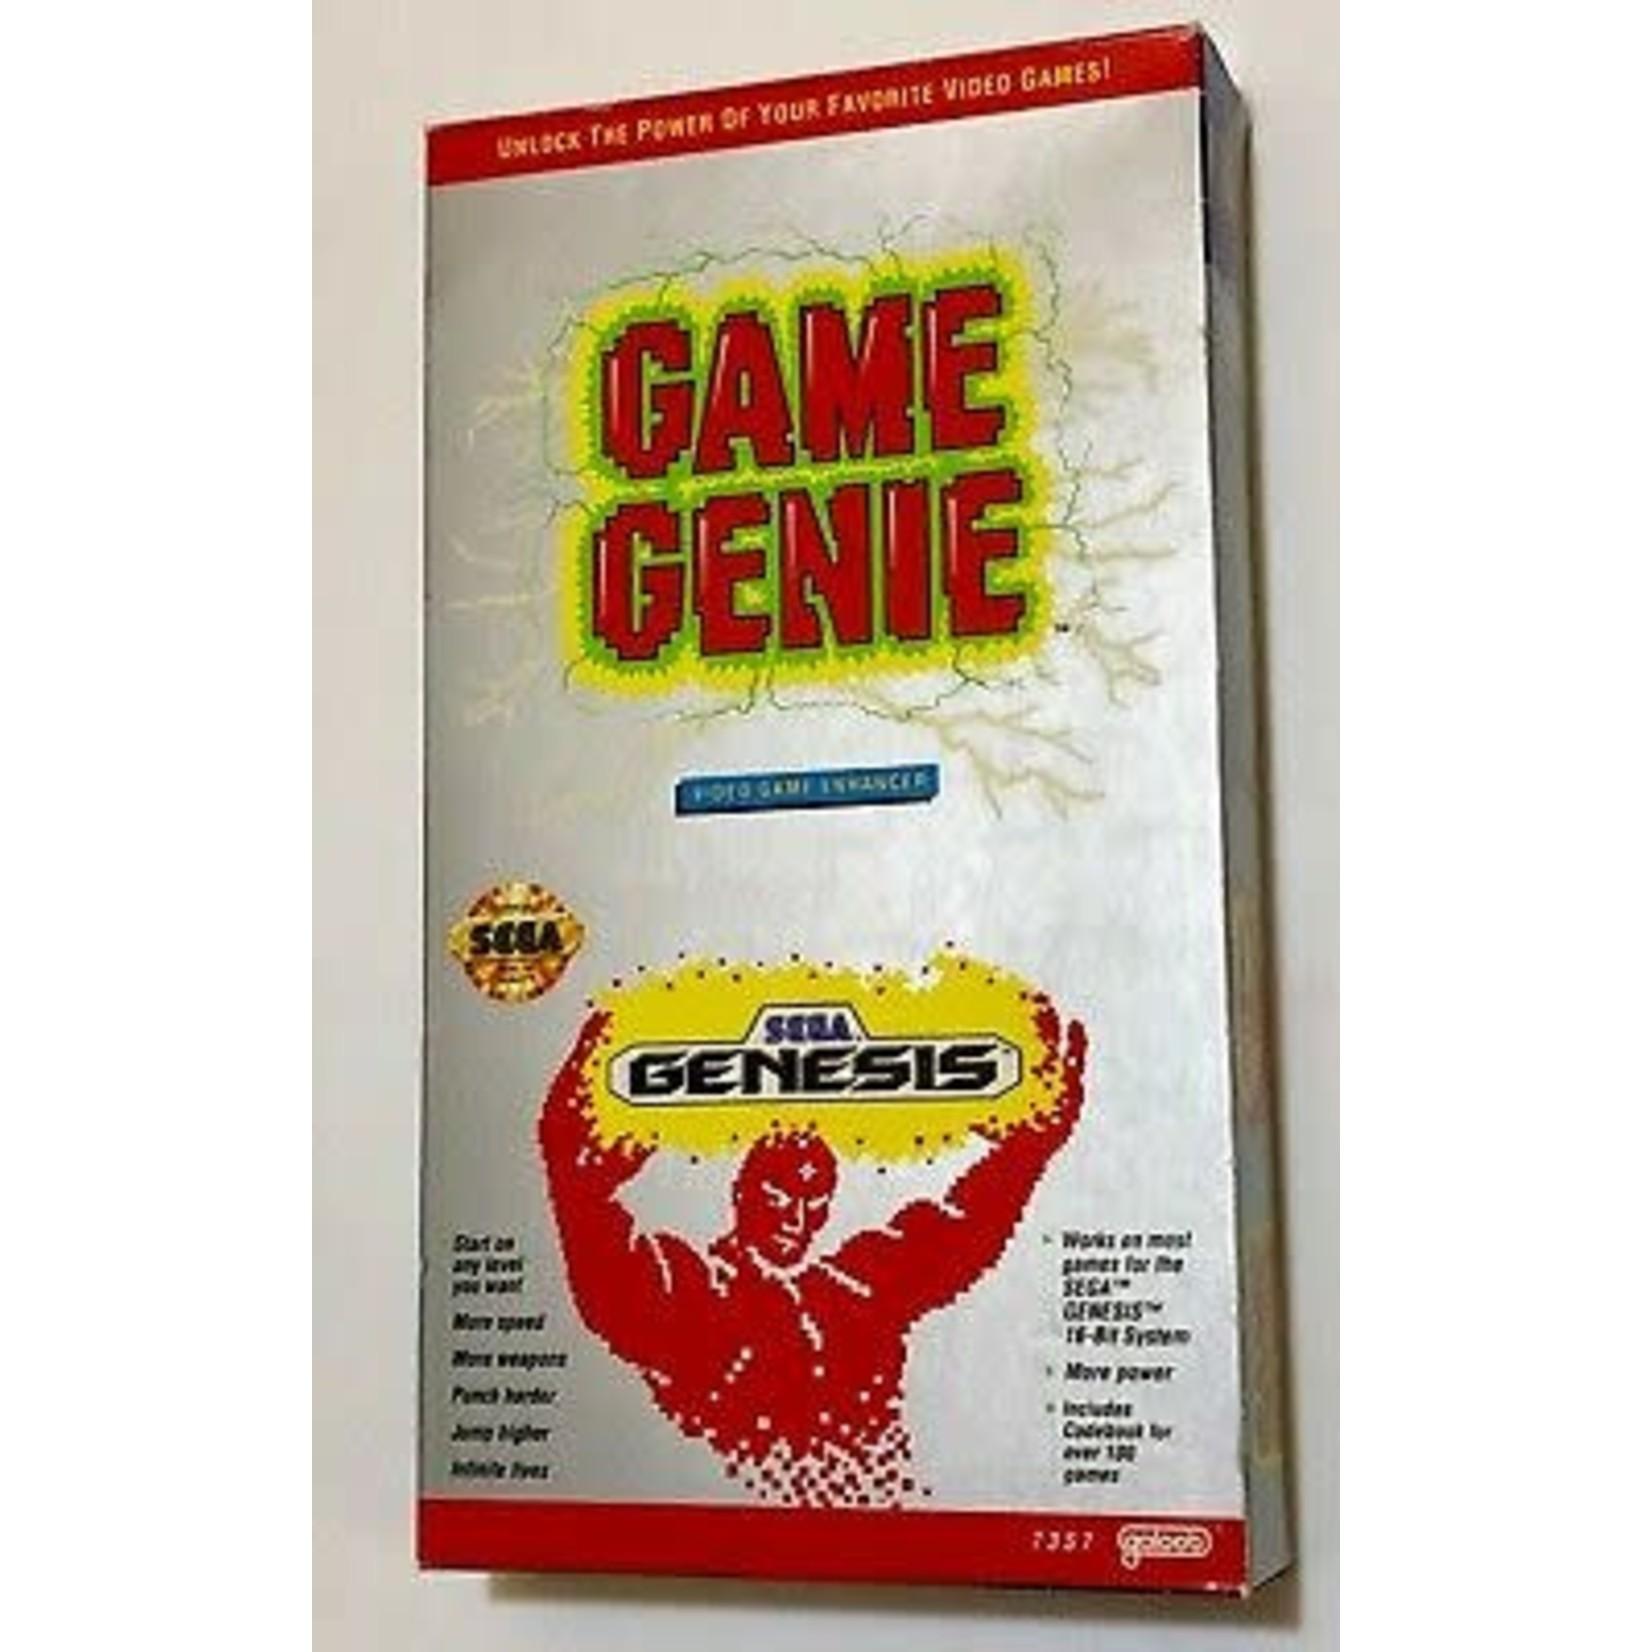 Complete Game Genie Video Game Enhancer (Sega Genesis) Cart Box Manual